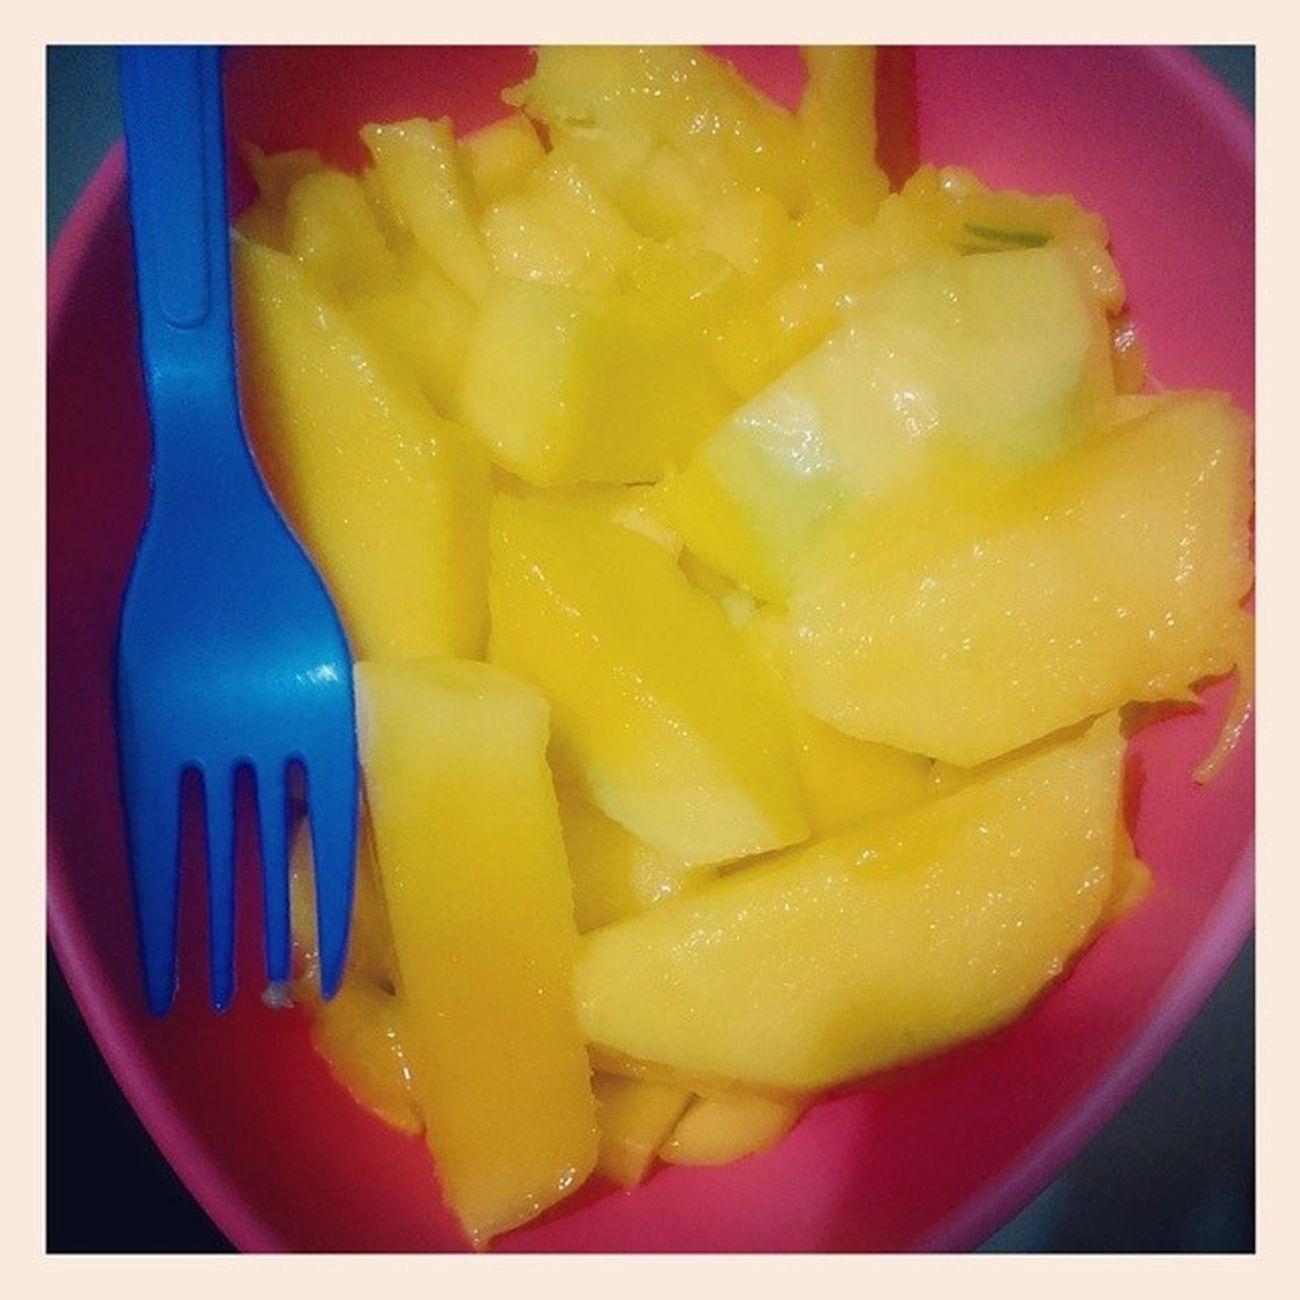 Fibres,vitamins,antioxidants-Mangoes Foodgramming Instagood Filter Fruit